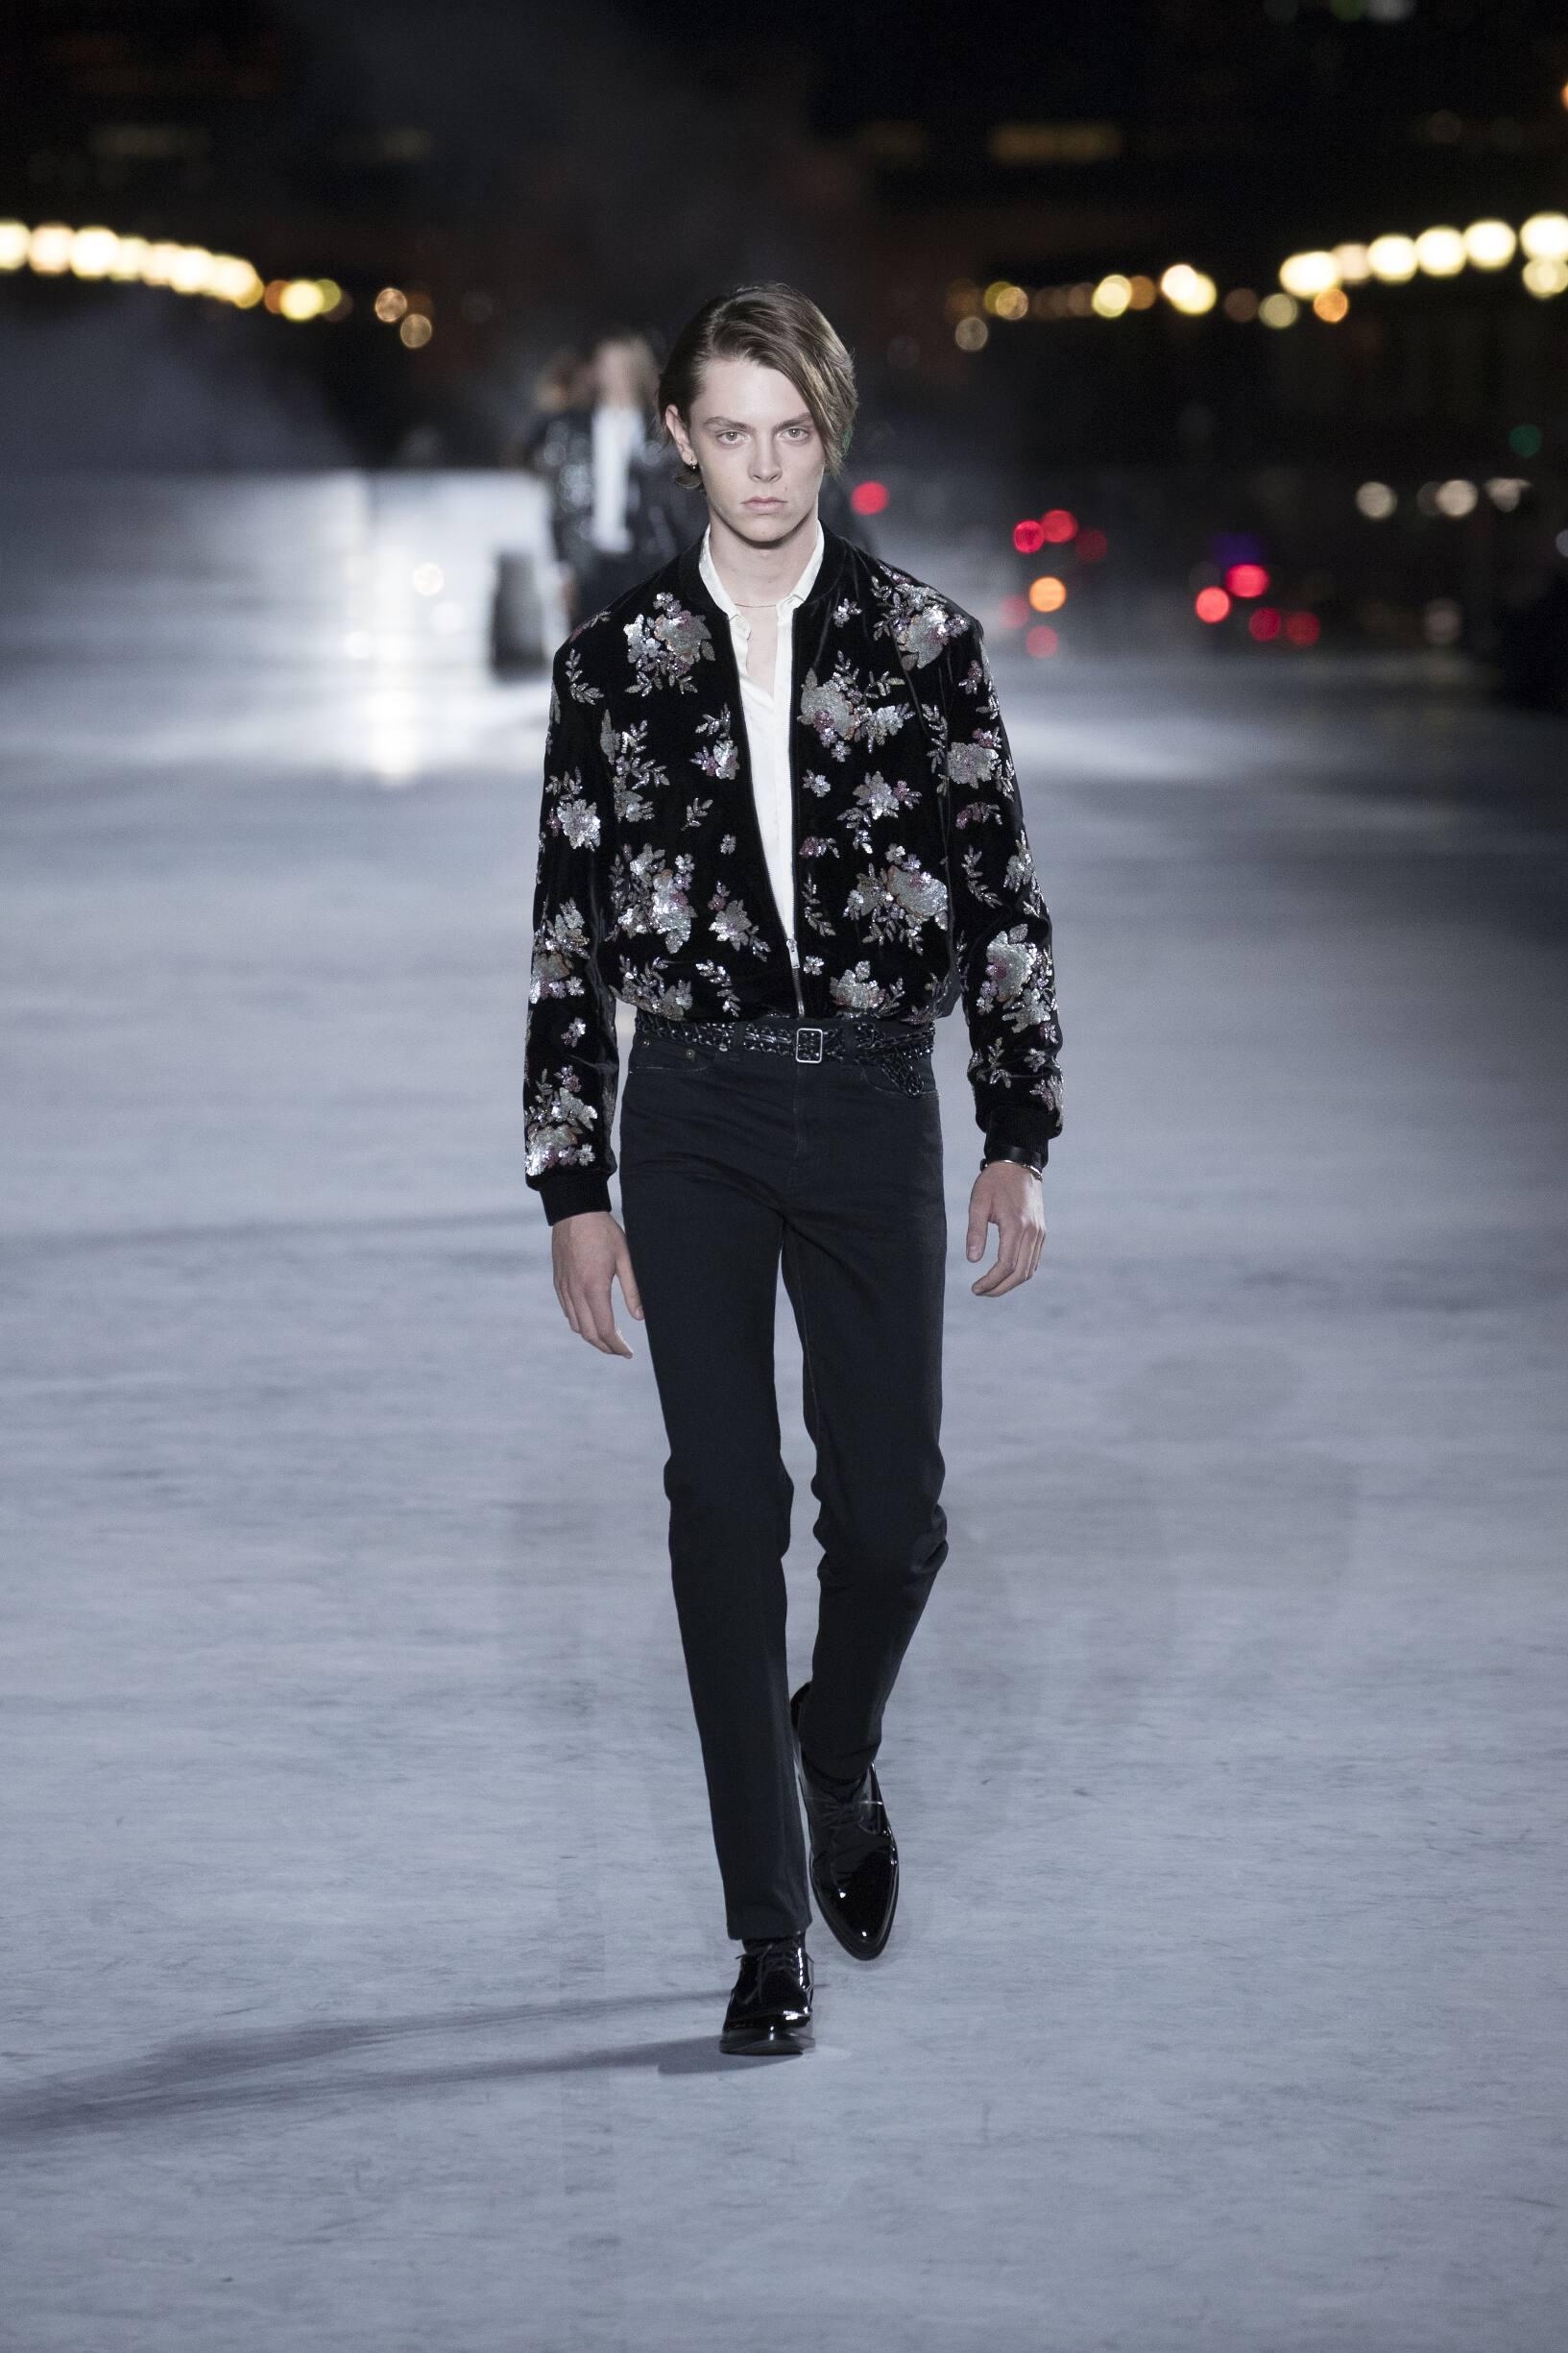 Saint Laurent Menswear Fashion Show